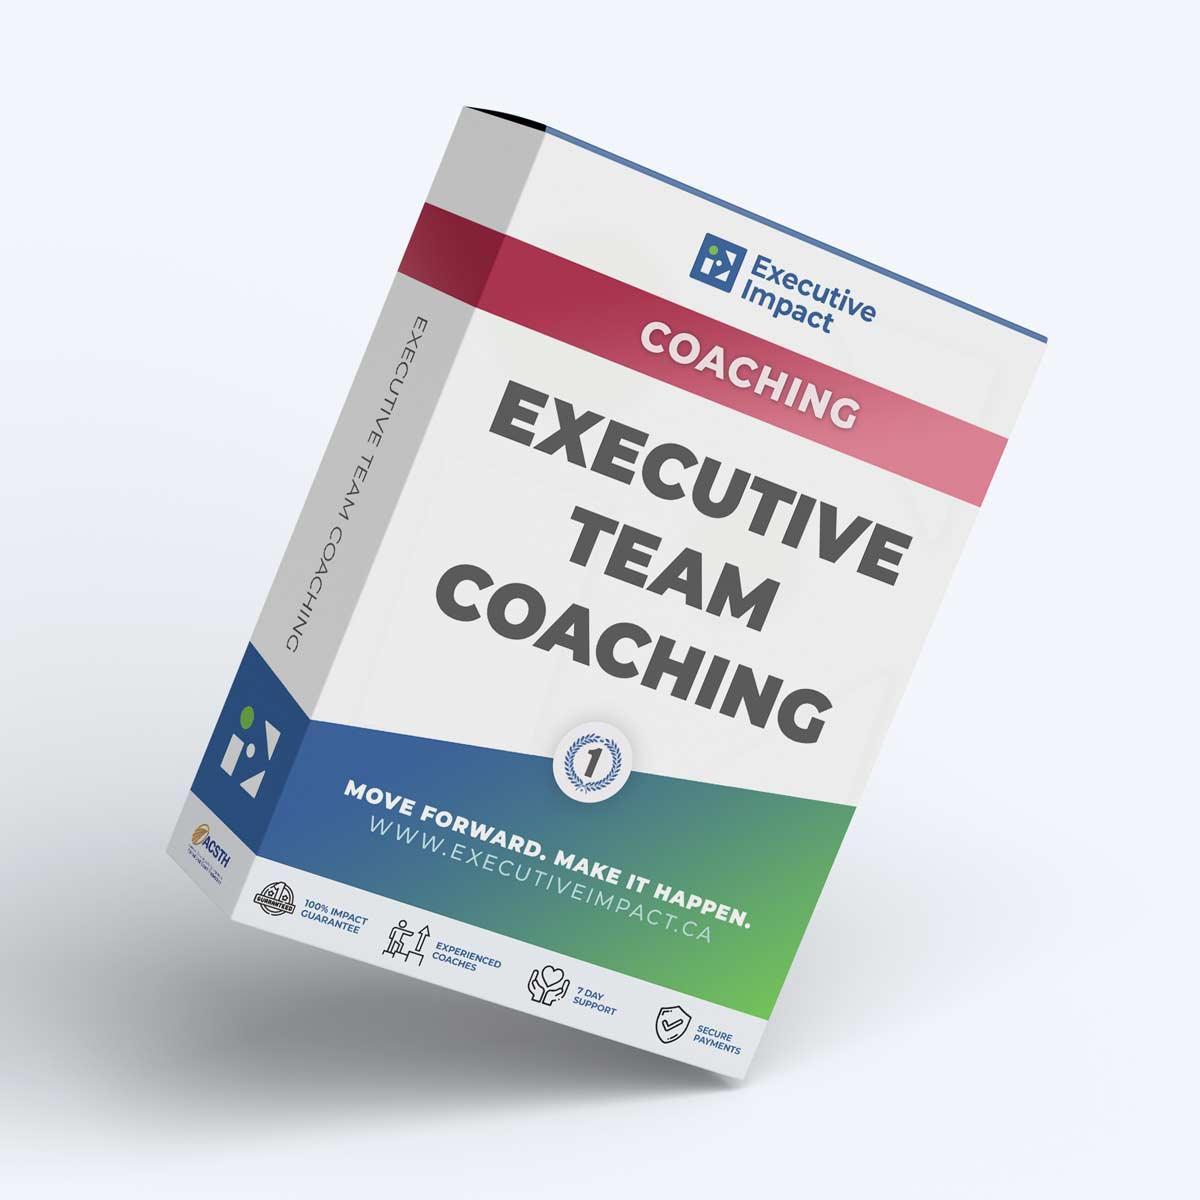 Executive Team Coaching by Executive Impact